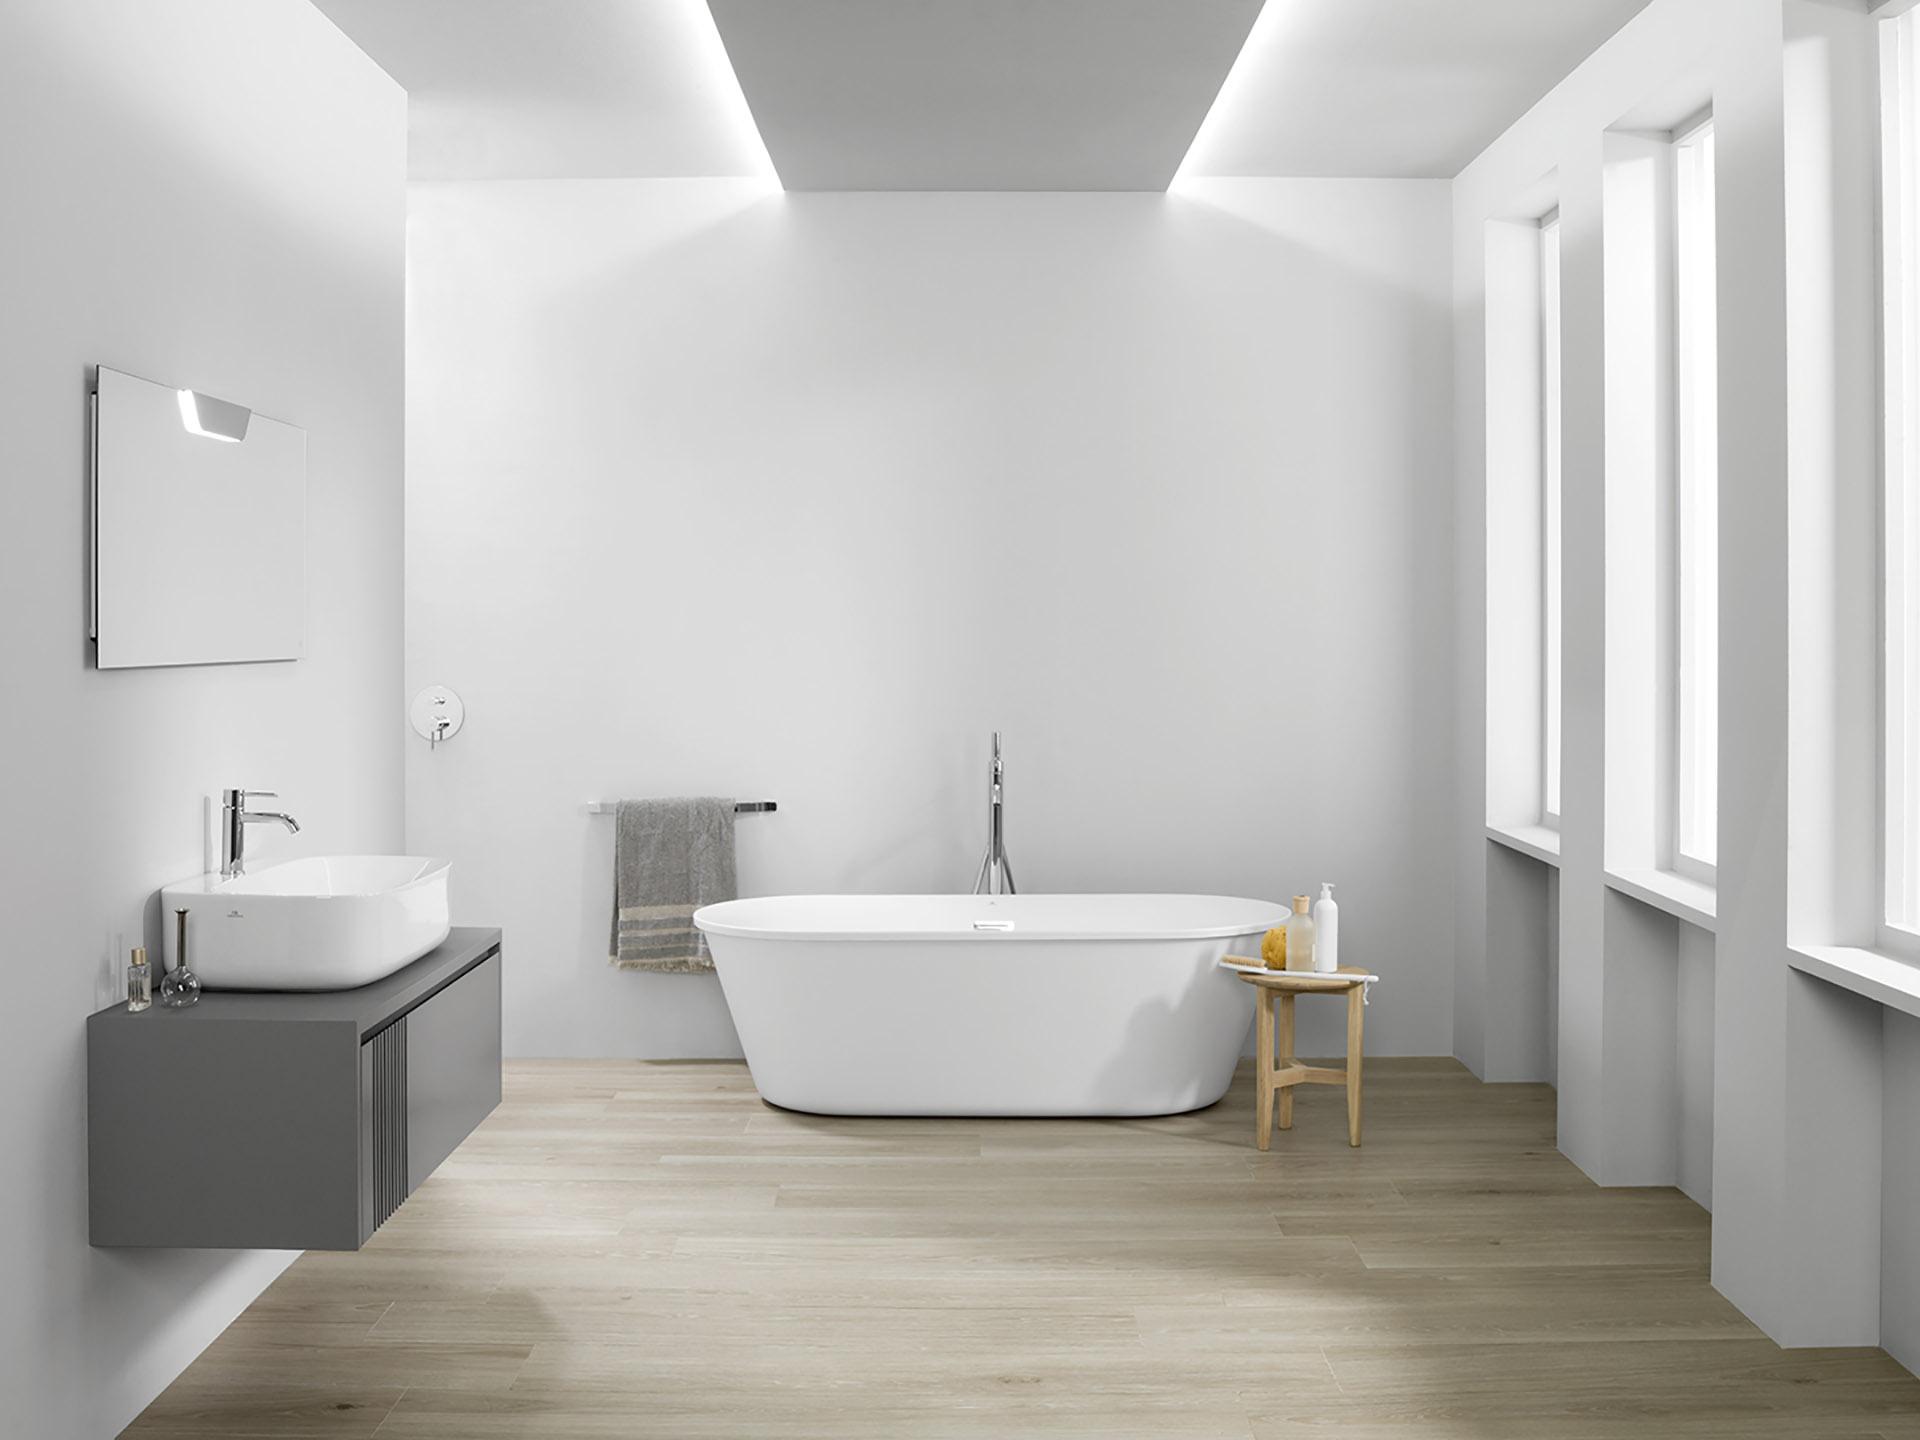 Arquitect Noken Porcelanosa Bathrooms